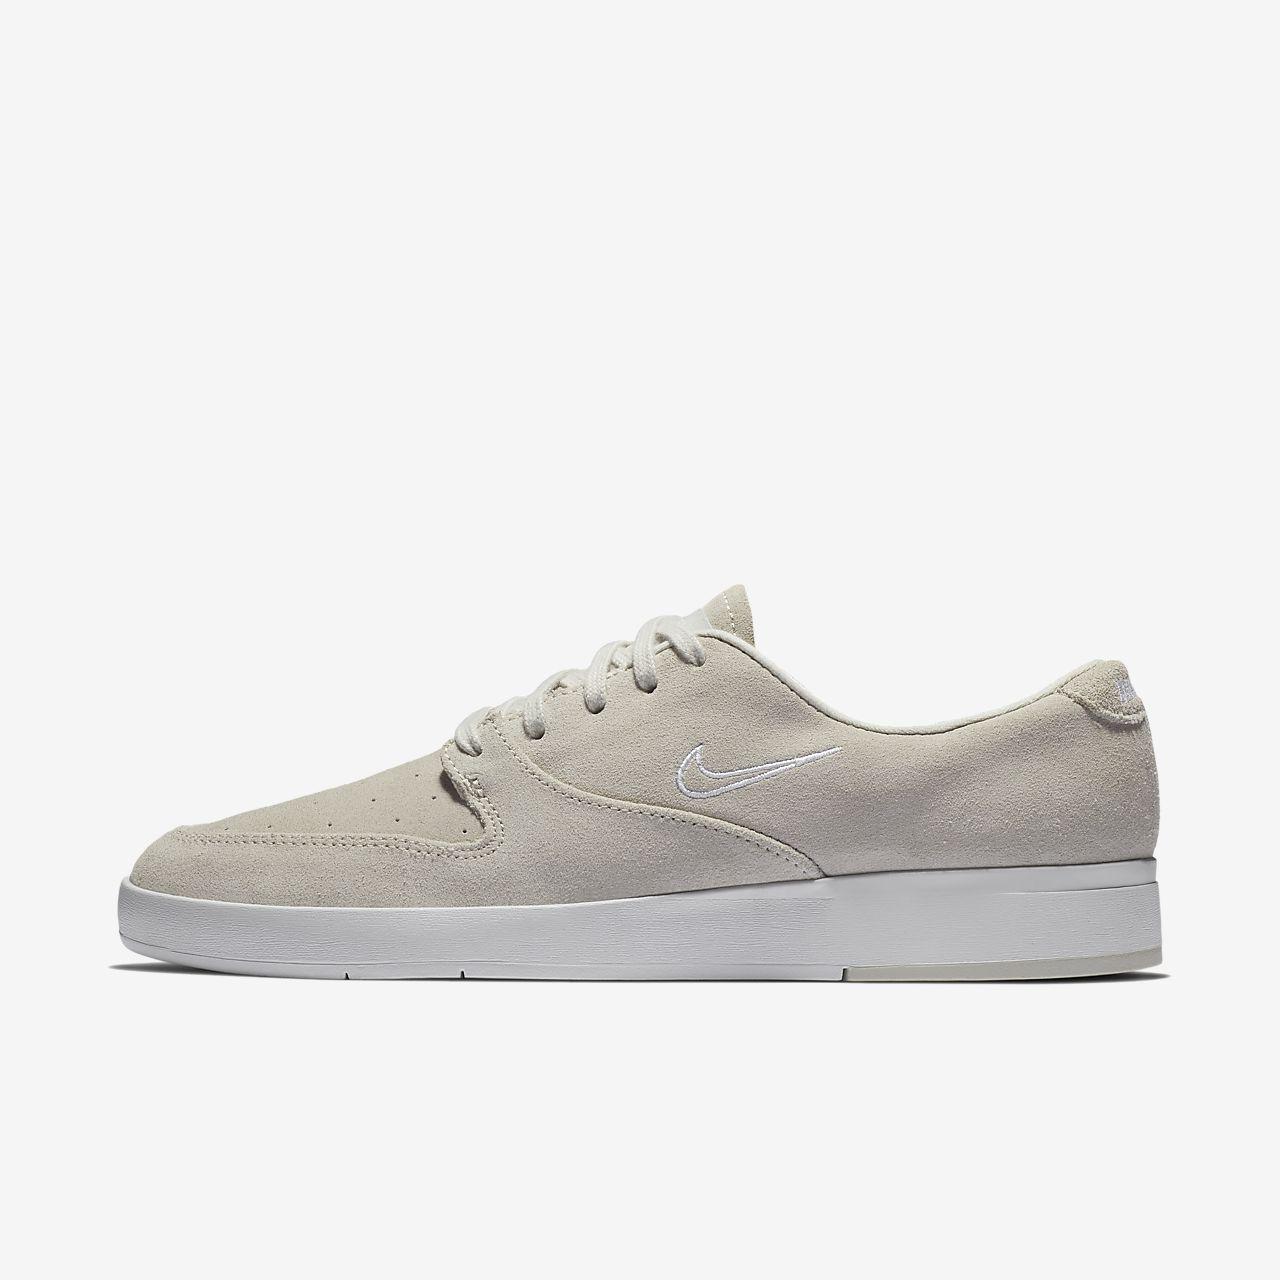 ... Nike SB Zoom Paul Rodriguez Ten Men's Skateboarding Shoe